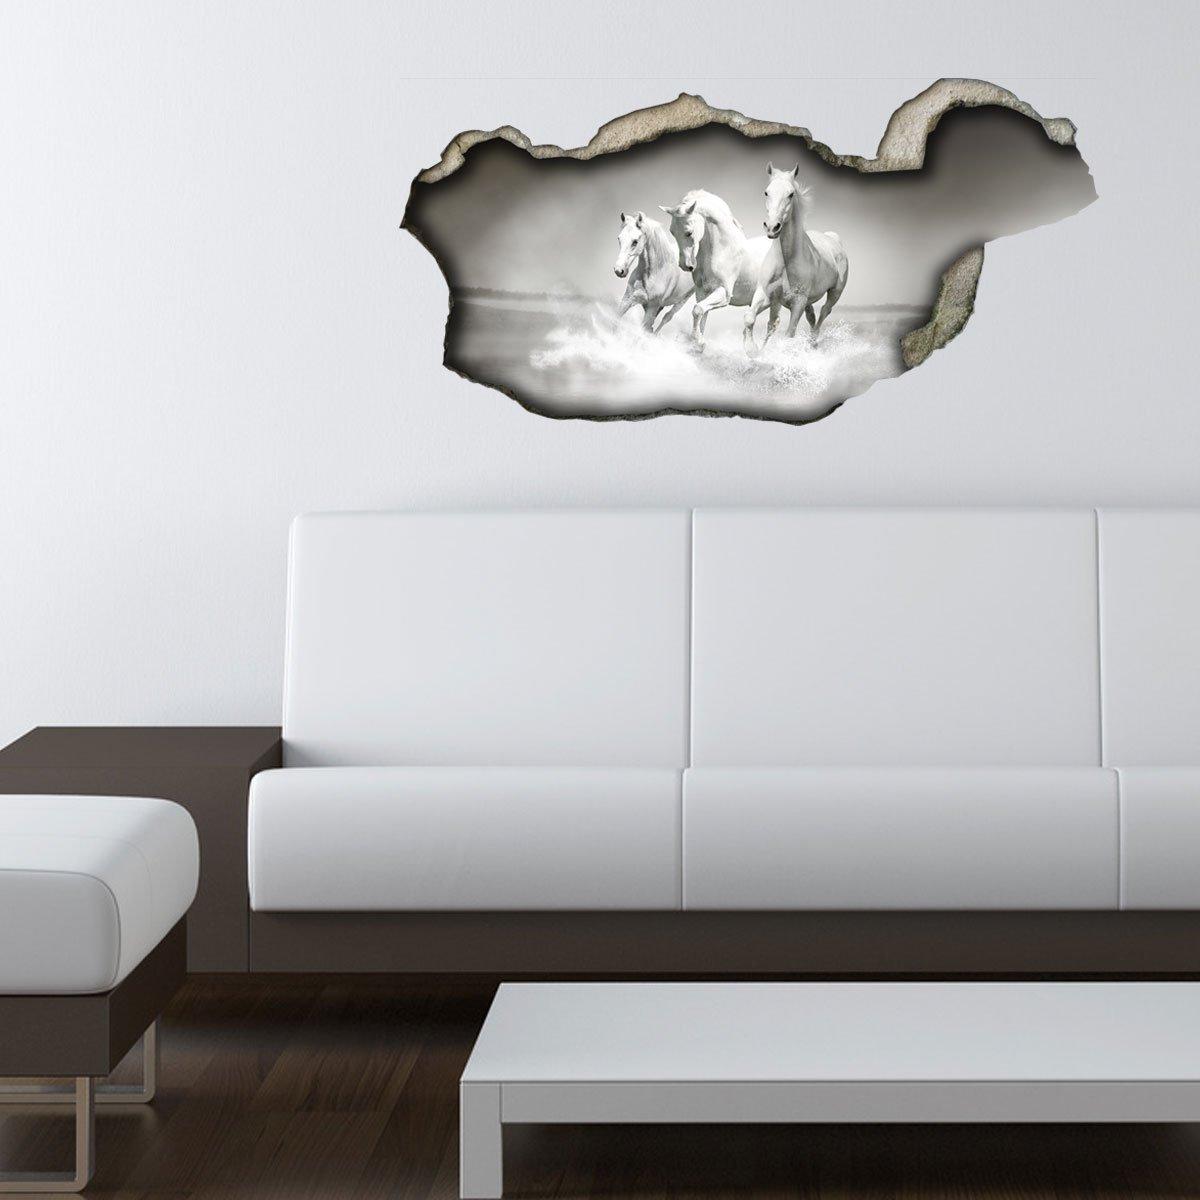 wanddeko kche full size of wohndesign unglaublich. Black Bedroom Furniture Sets. Home Design Ideas